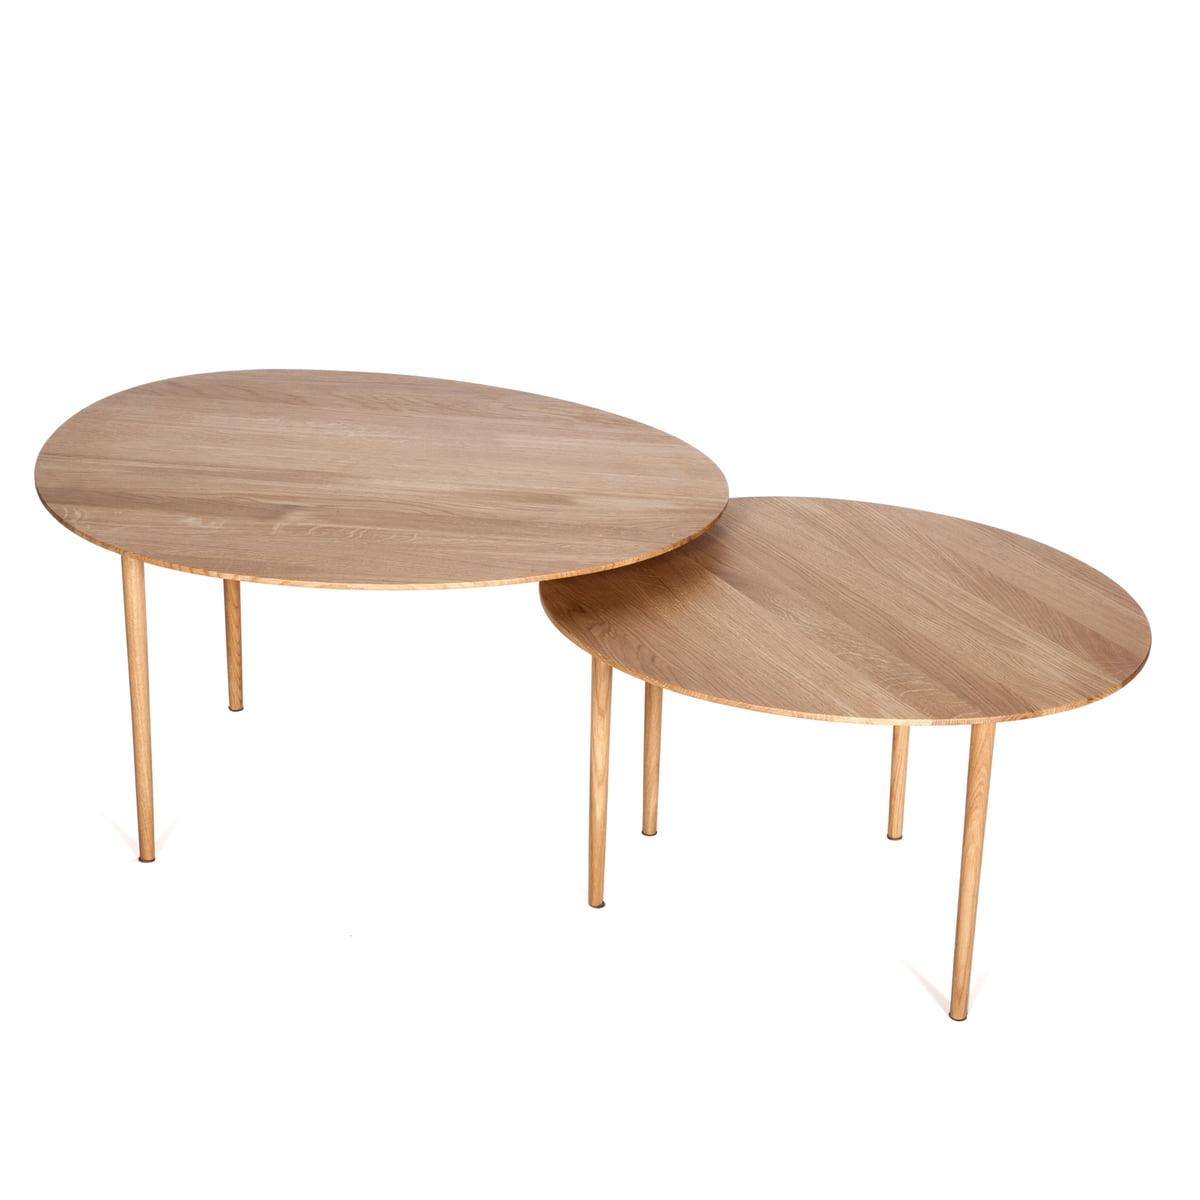 Hans Hansen - Nenufar Side Table Set of 2 solid oak top view  sc 1 st  Connox & Nenufar Side Tables by Hans Hansen